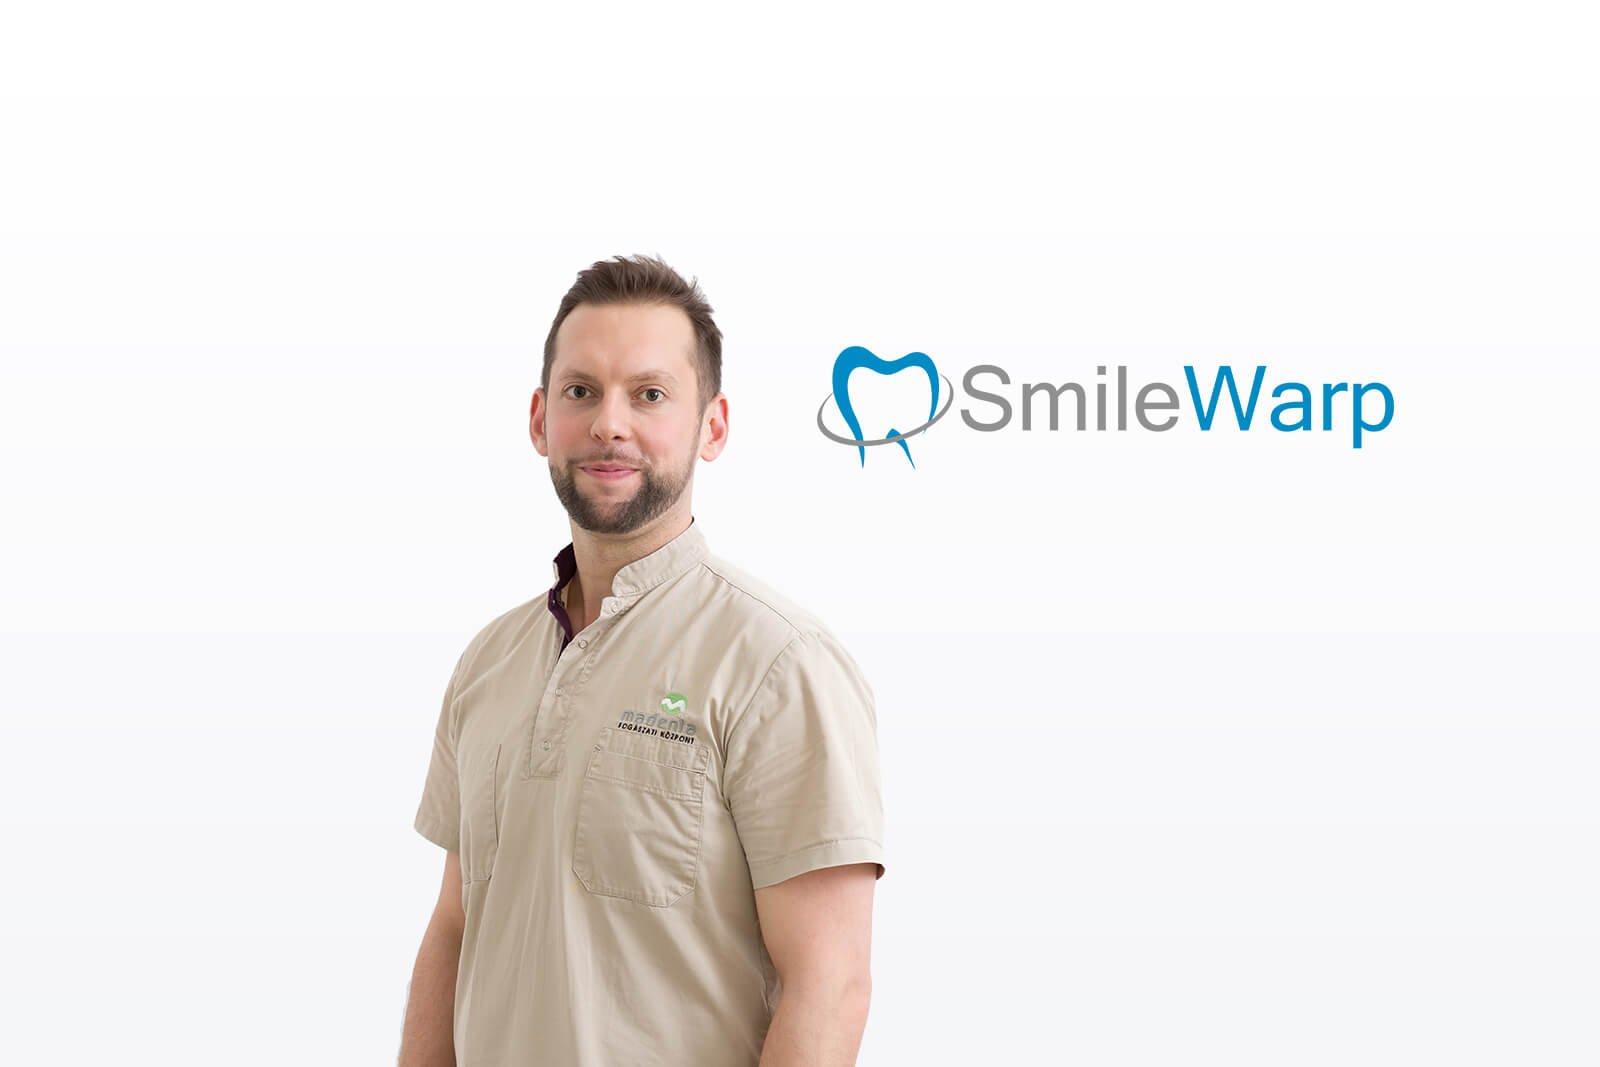 SmileWarp: A fog, jövő időben